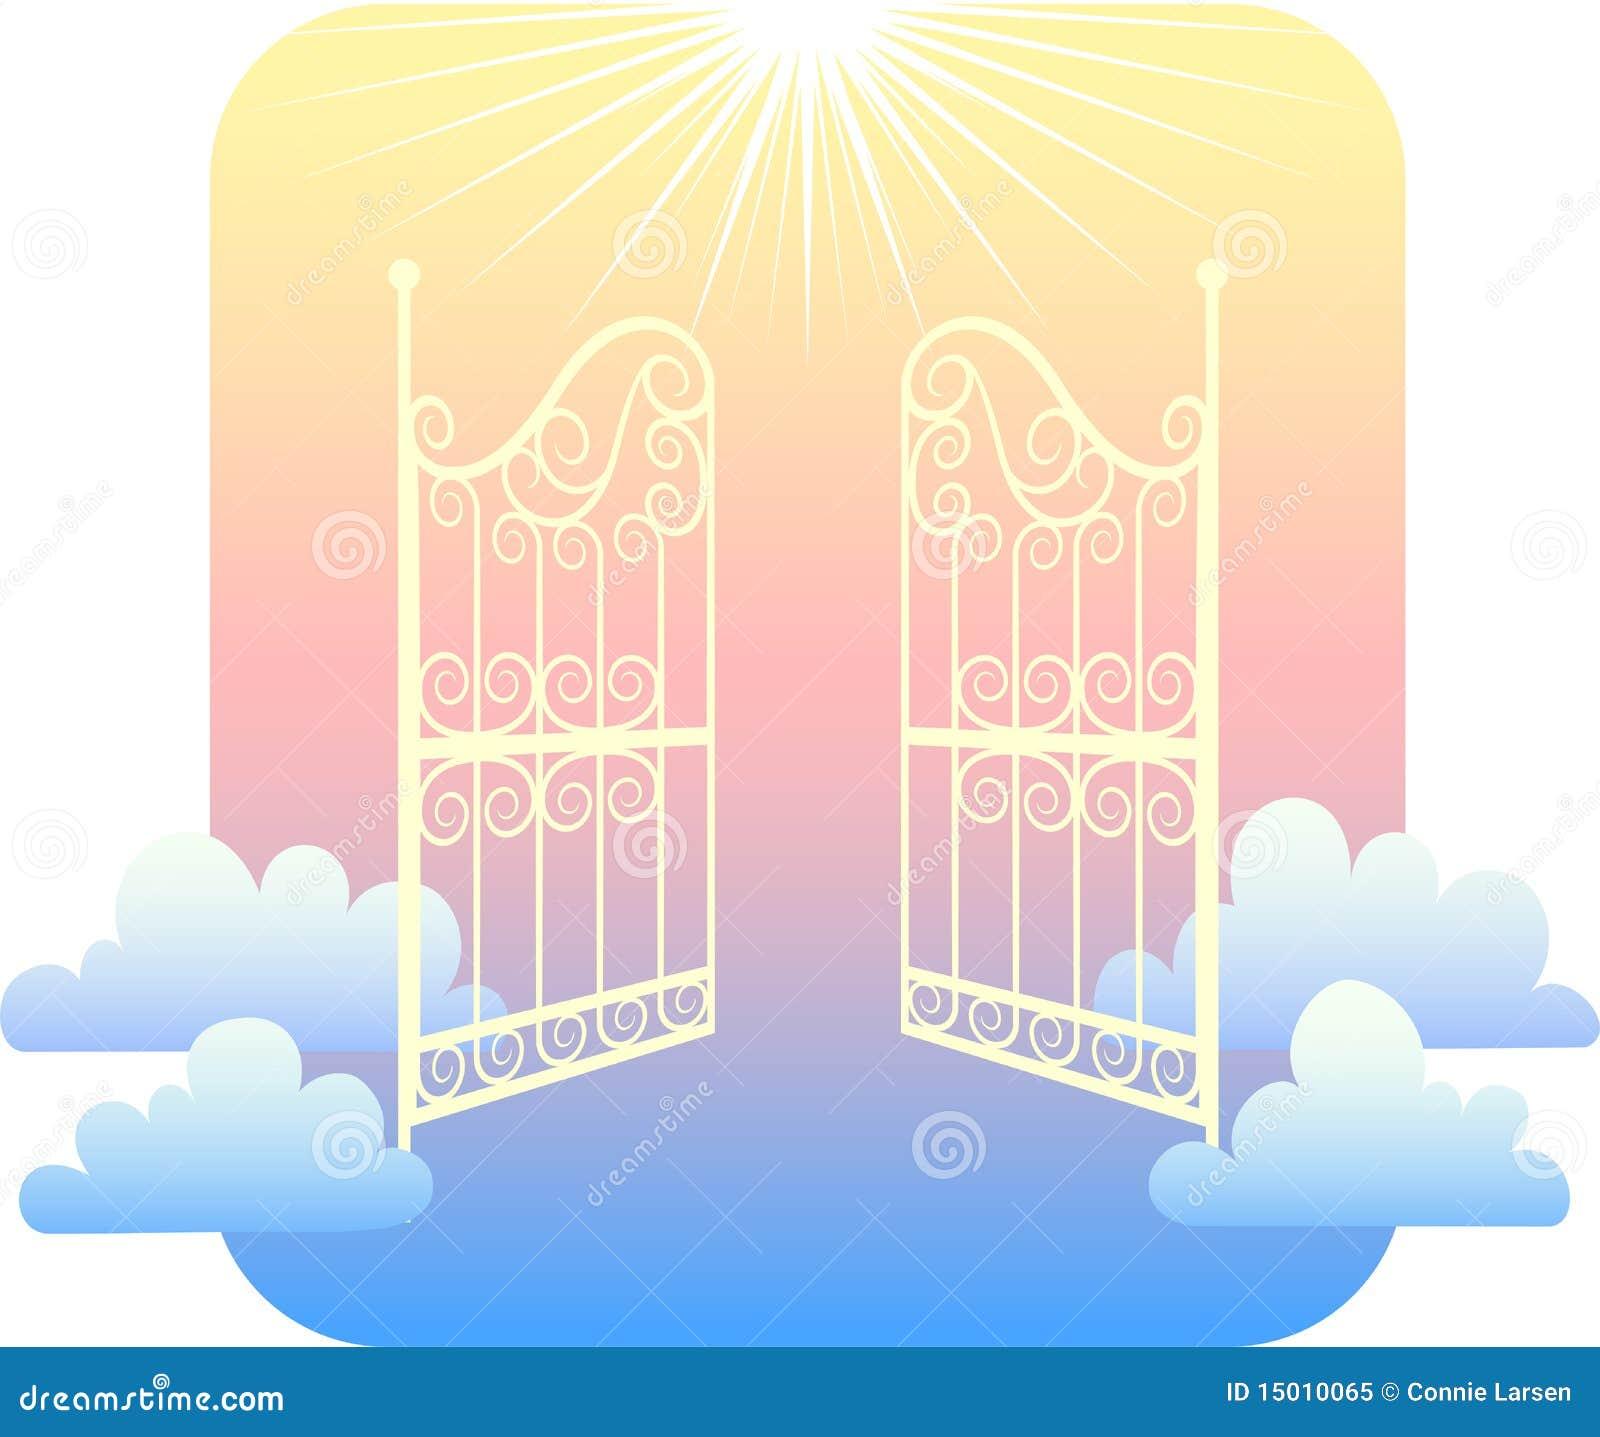 free christian clipart heaven - photo #19